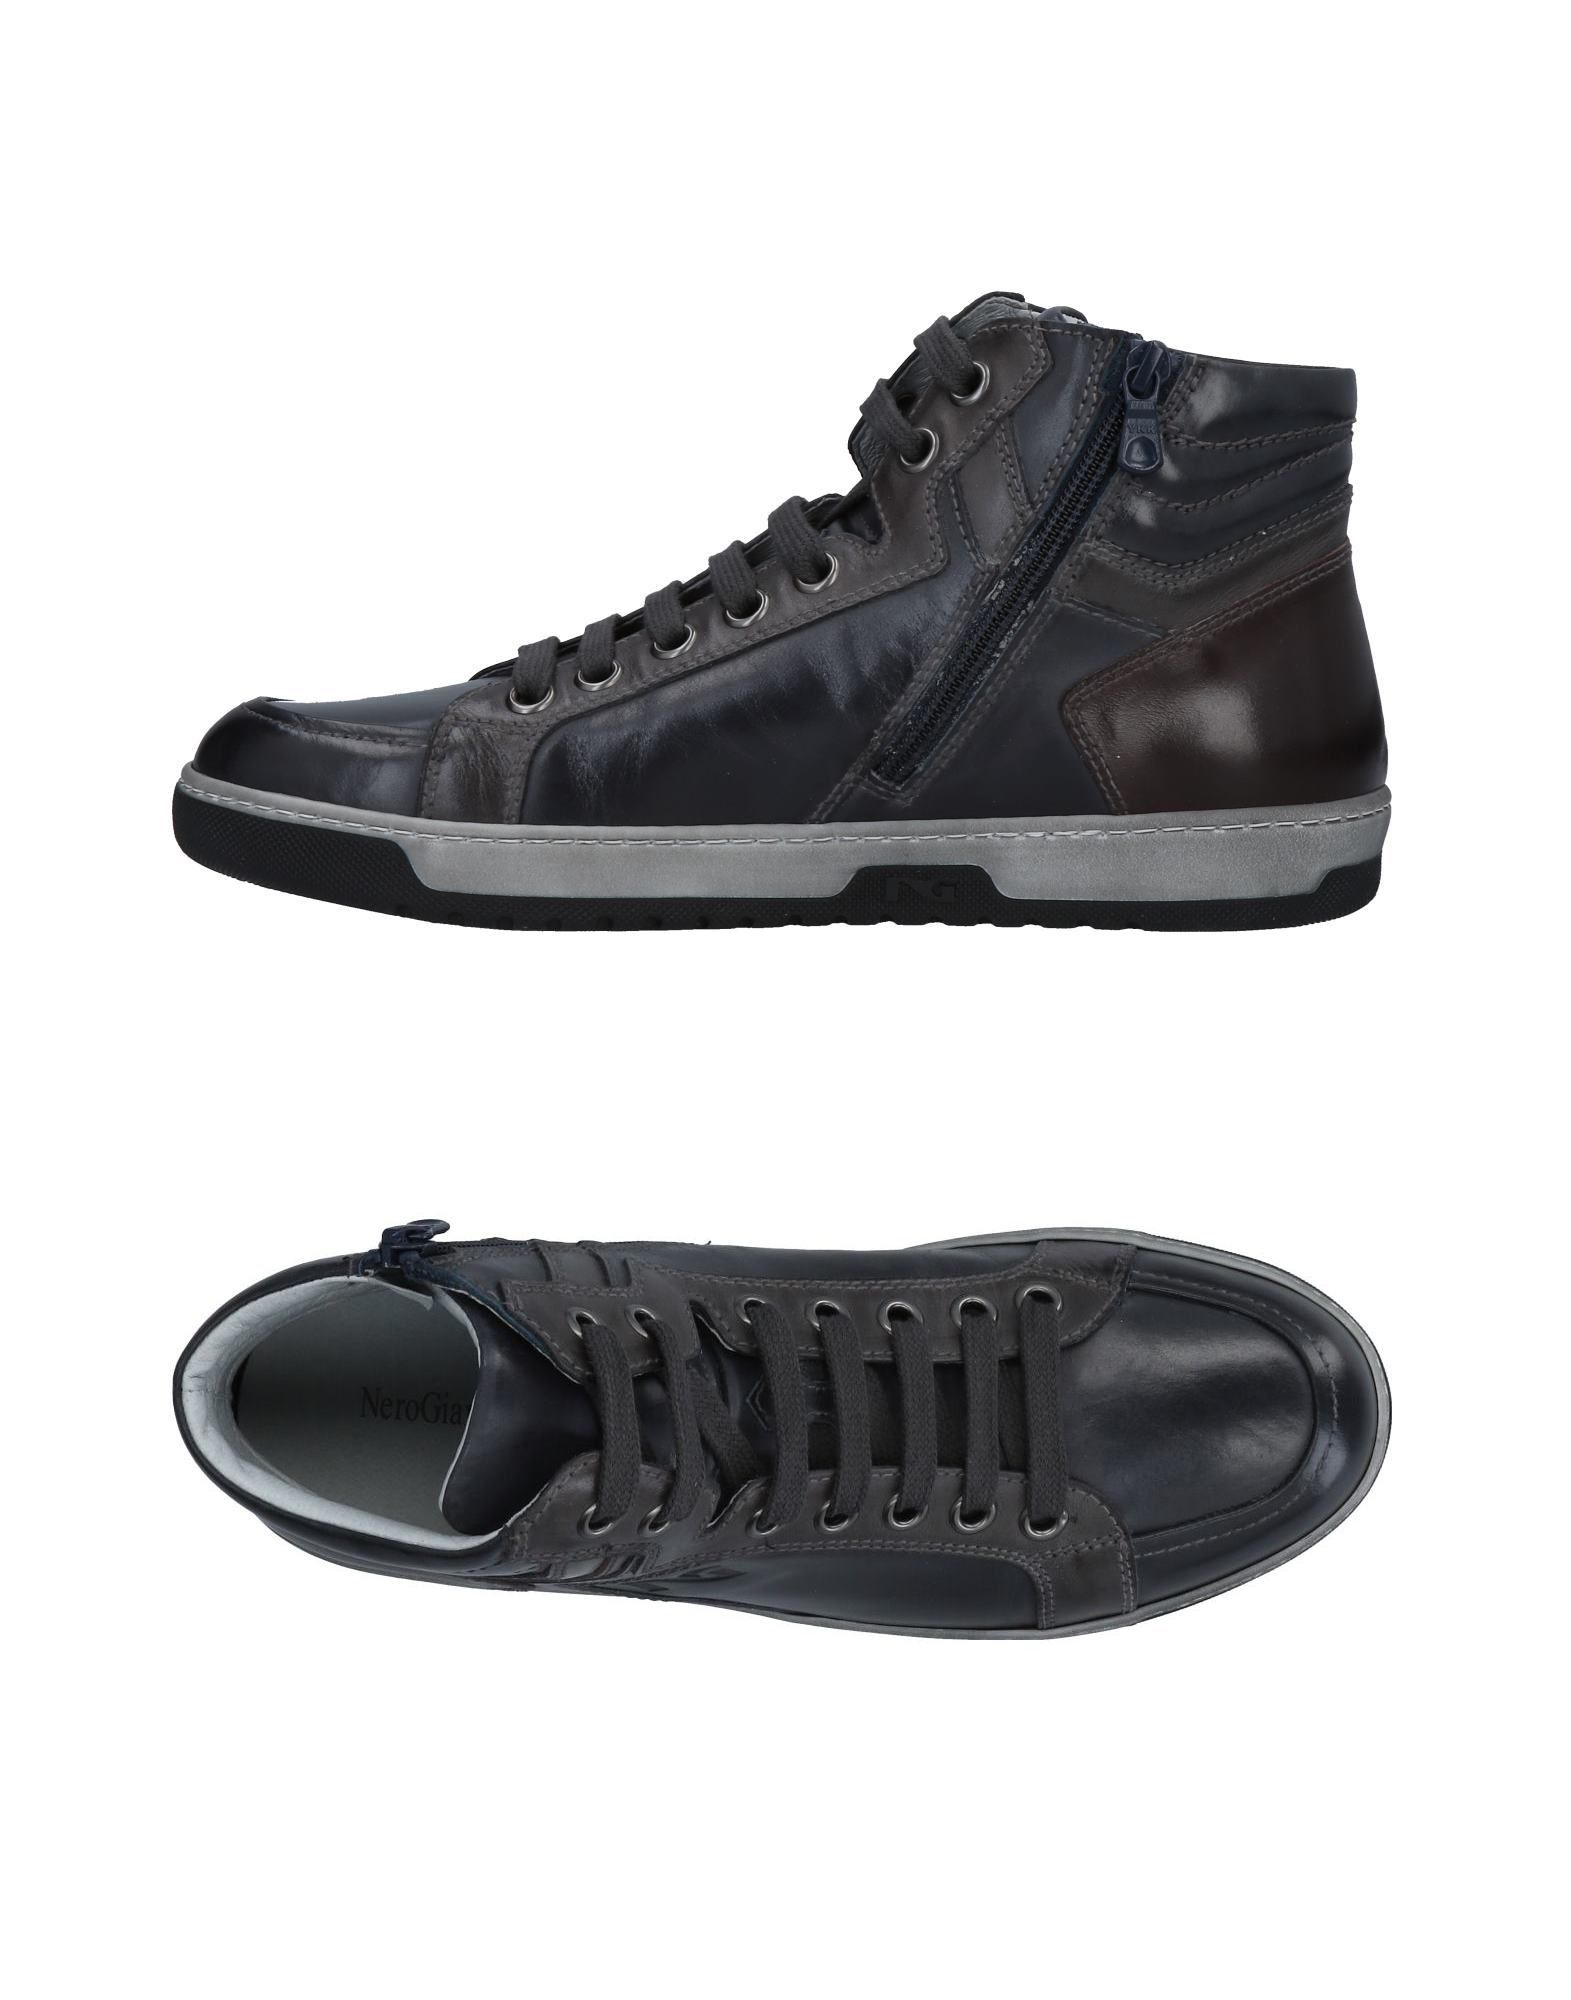 Rabatt echte Schuhe Nero Giardini Sneakers Herren  11485413RK